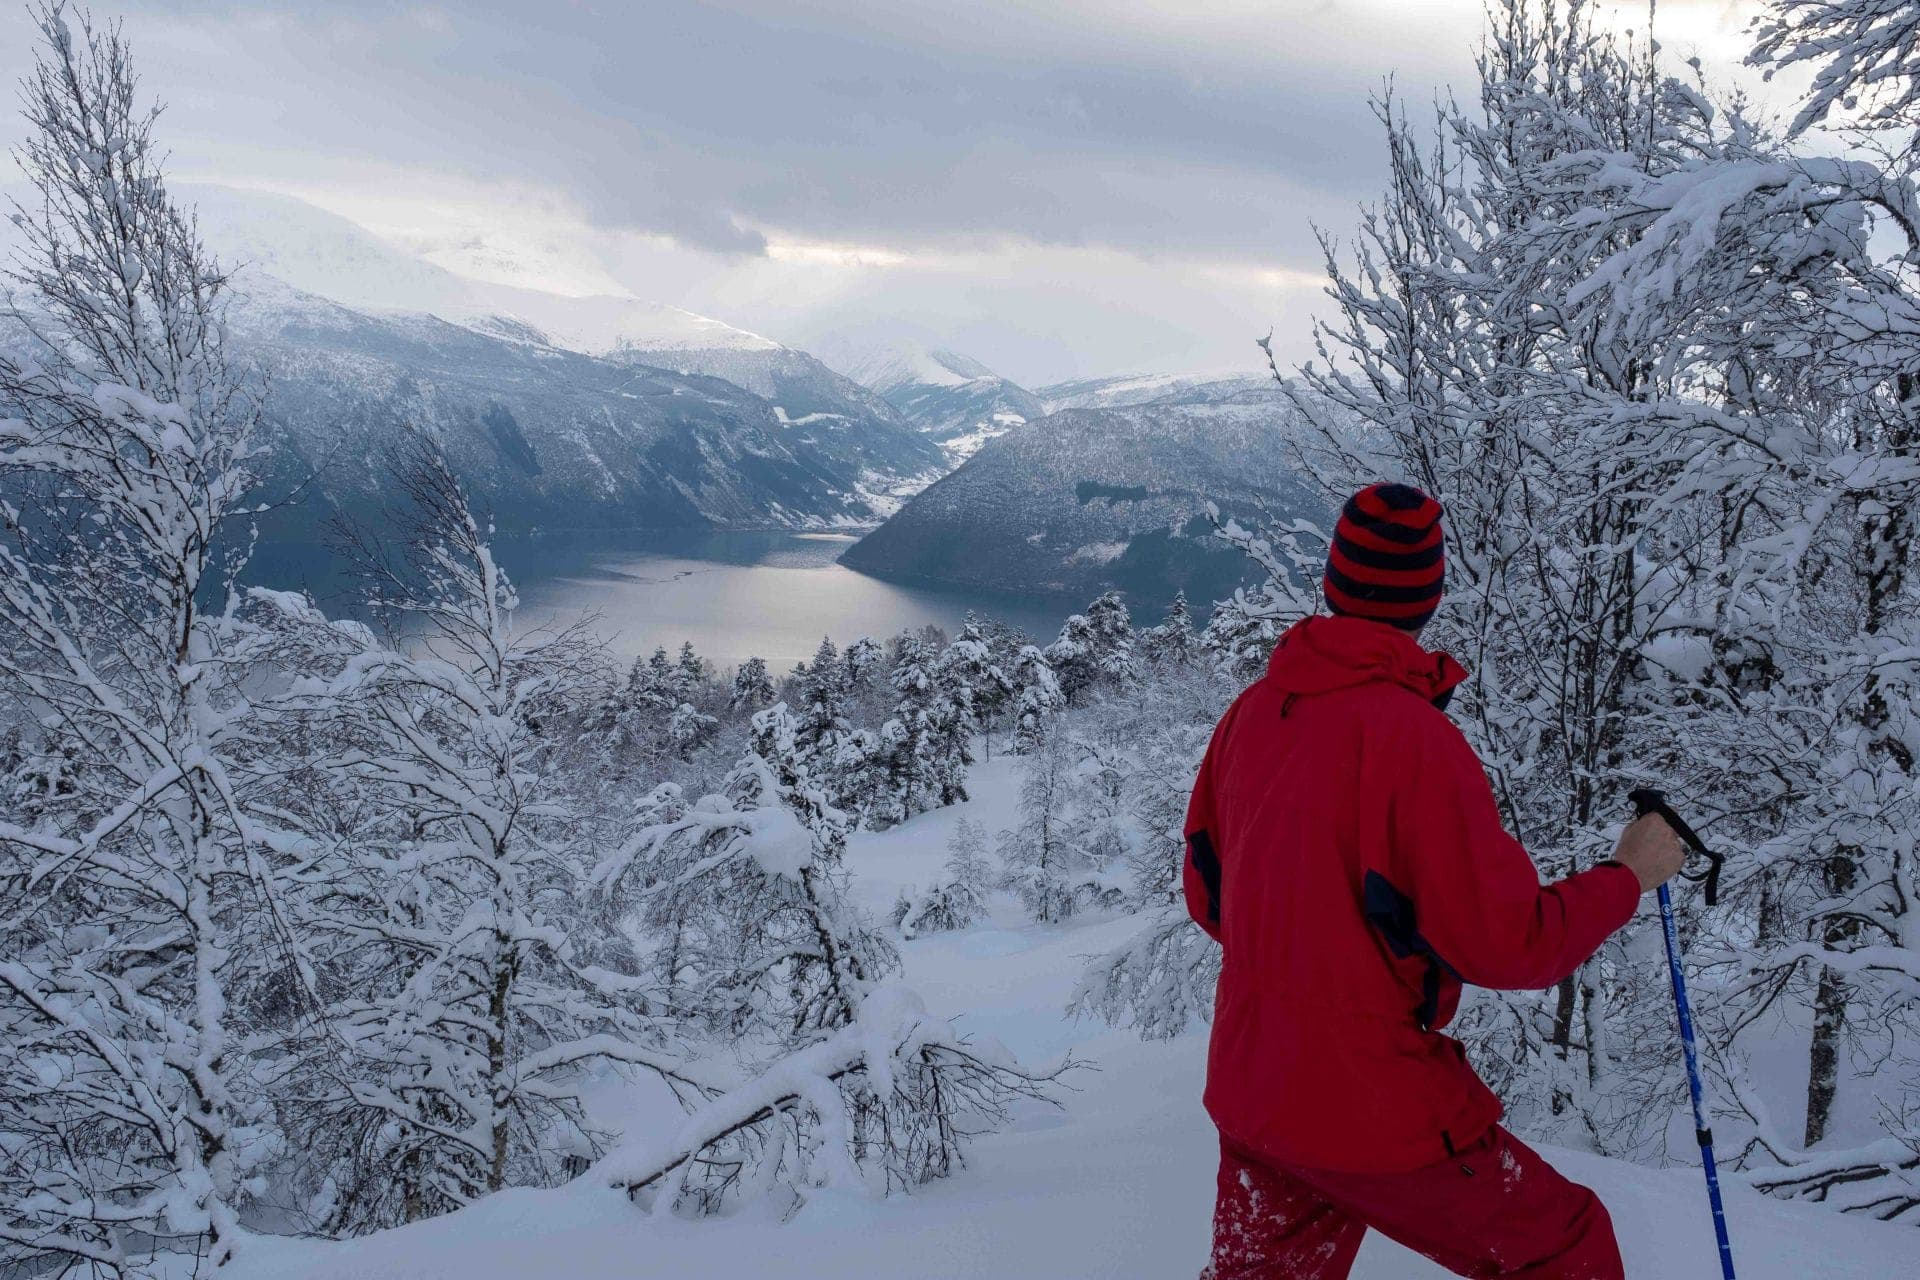 Snowshoe hike in amazing Balestrand